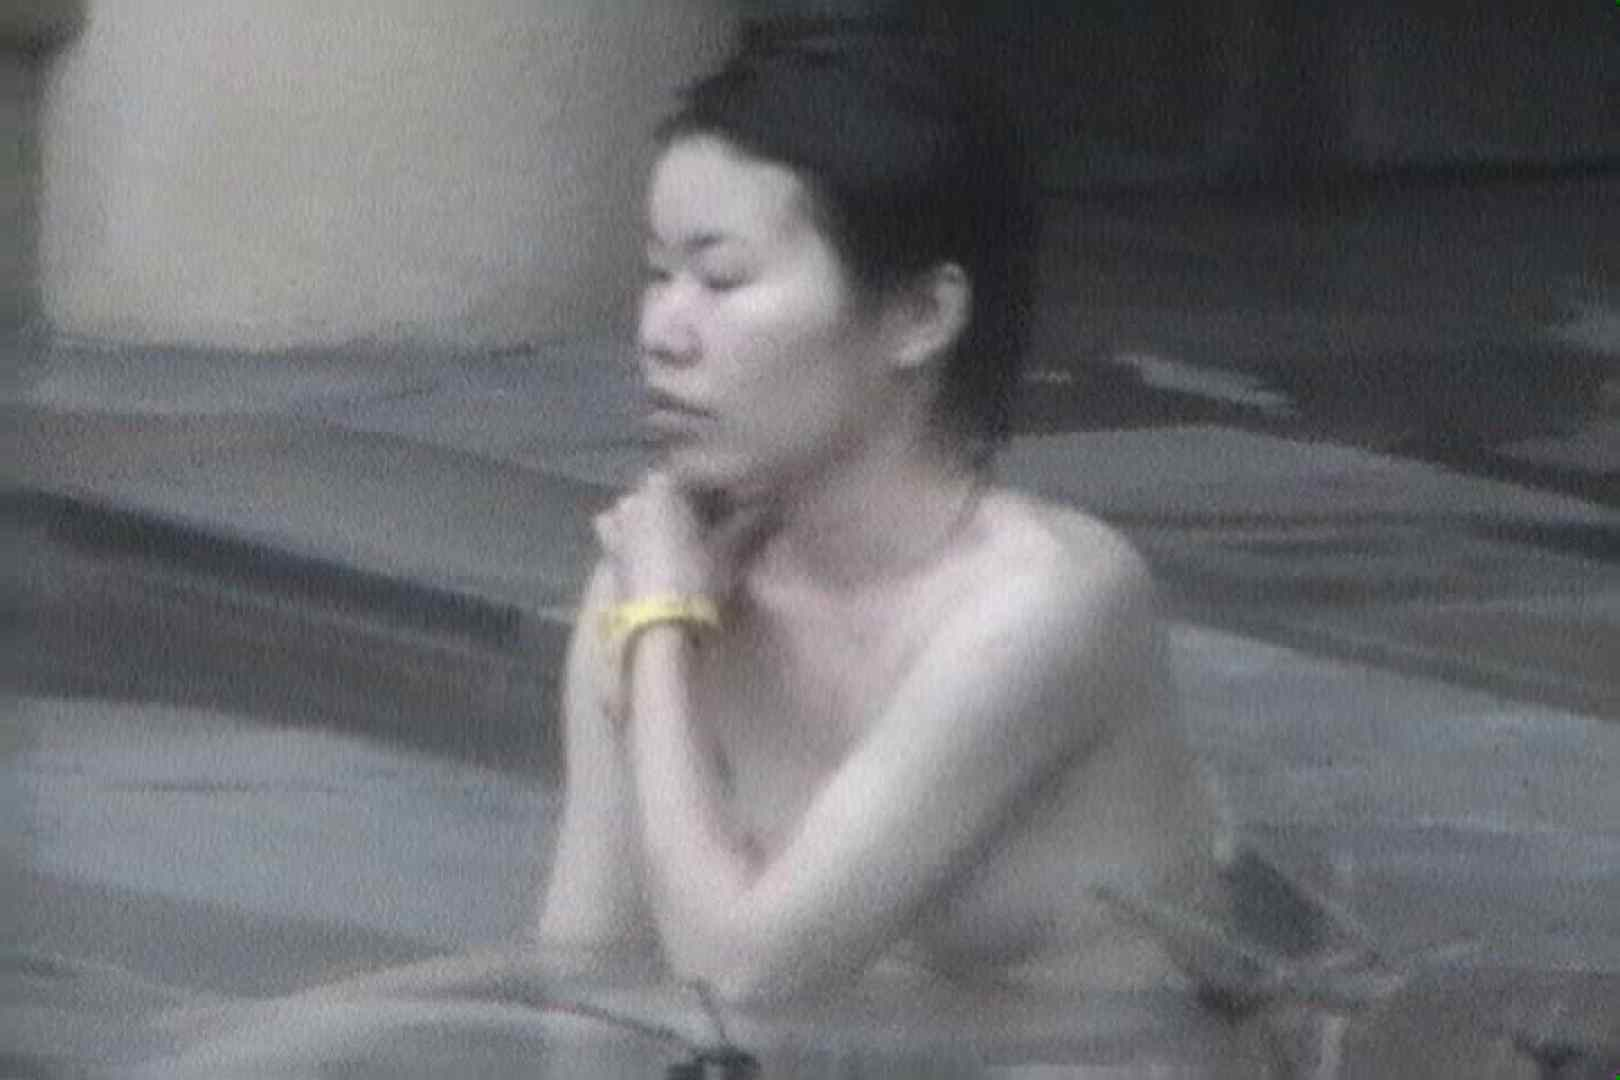 Aquaな露天風呂Vol.556 露天風呂編  99PIX 66